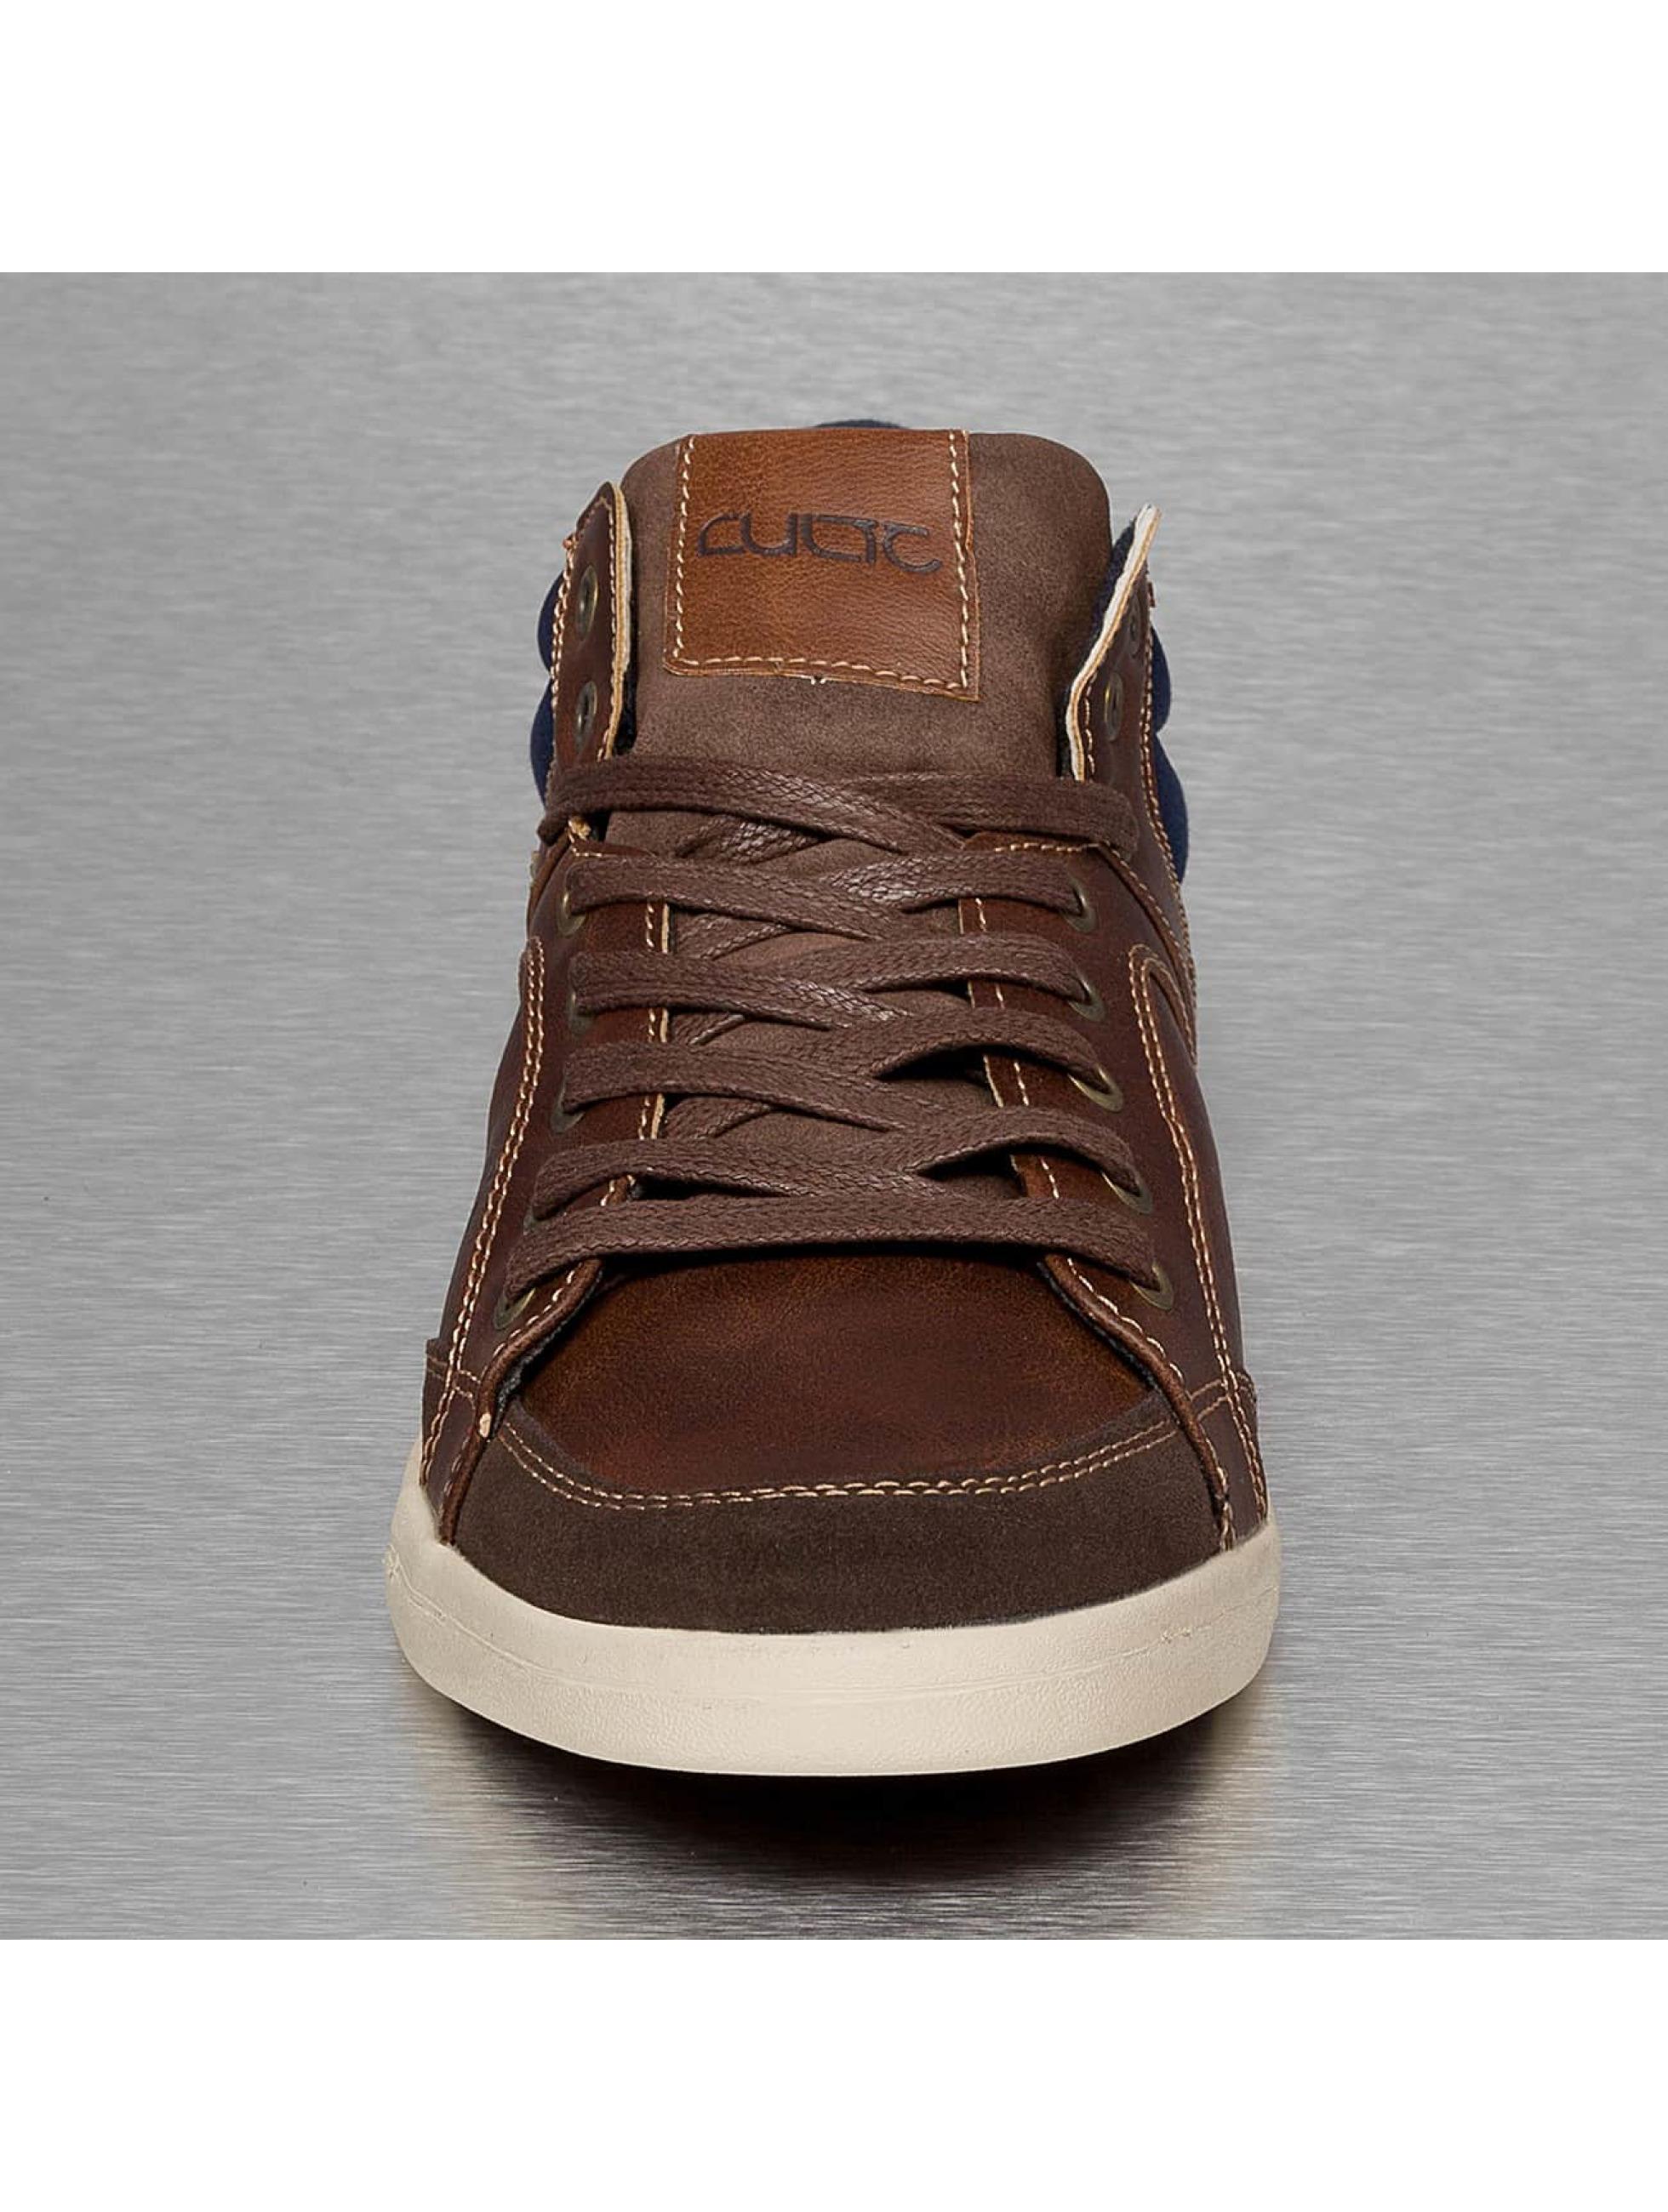 New York Style sneaker Genua khaki